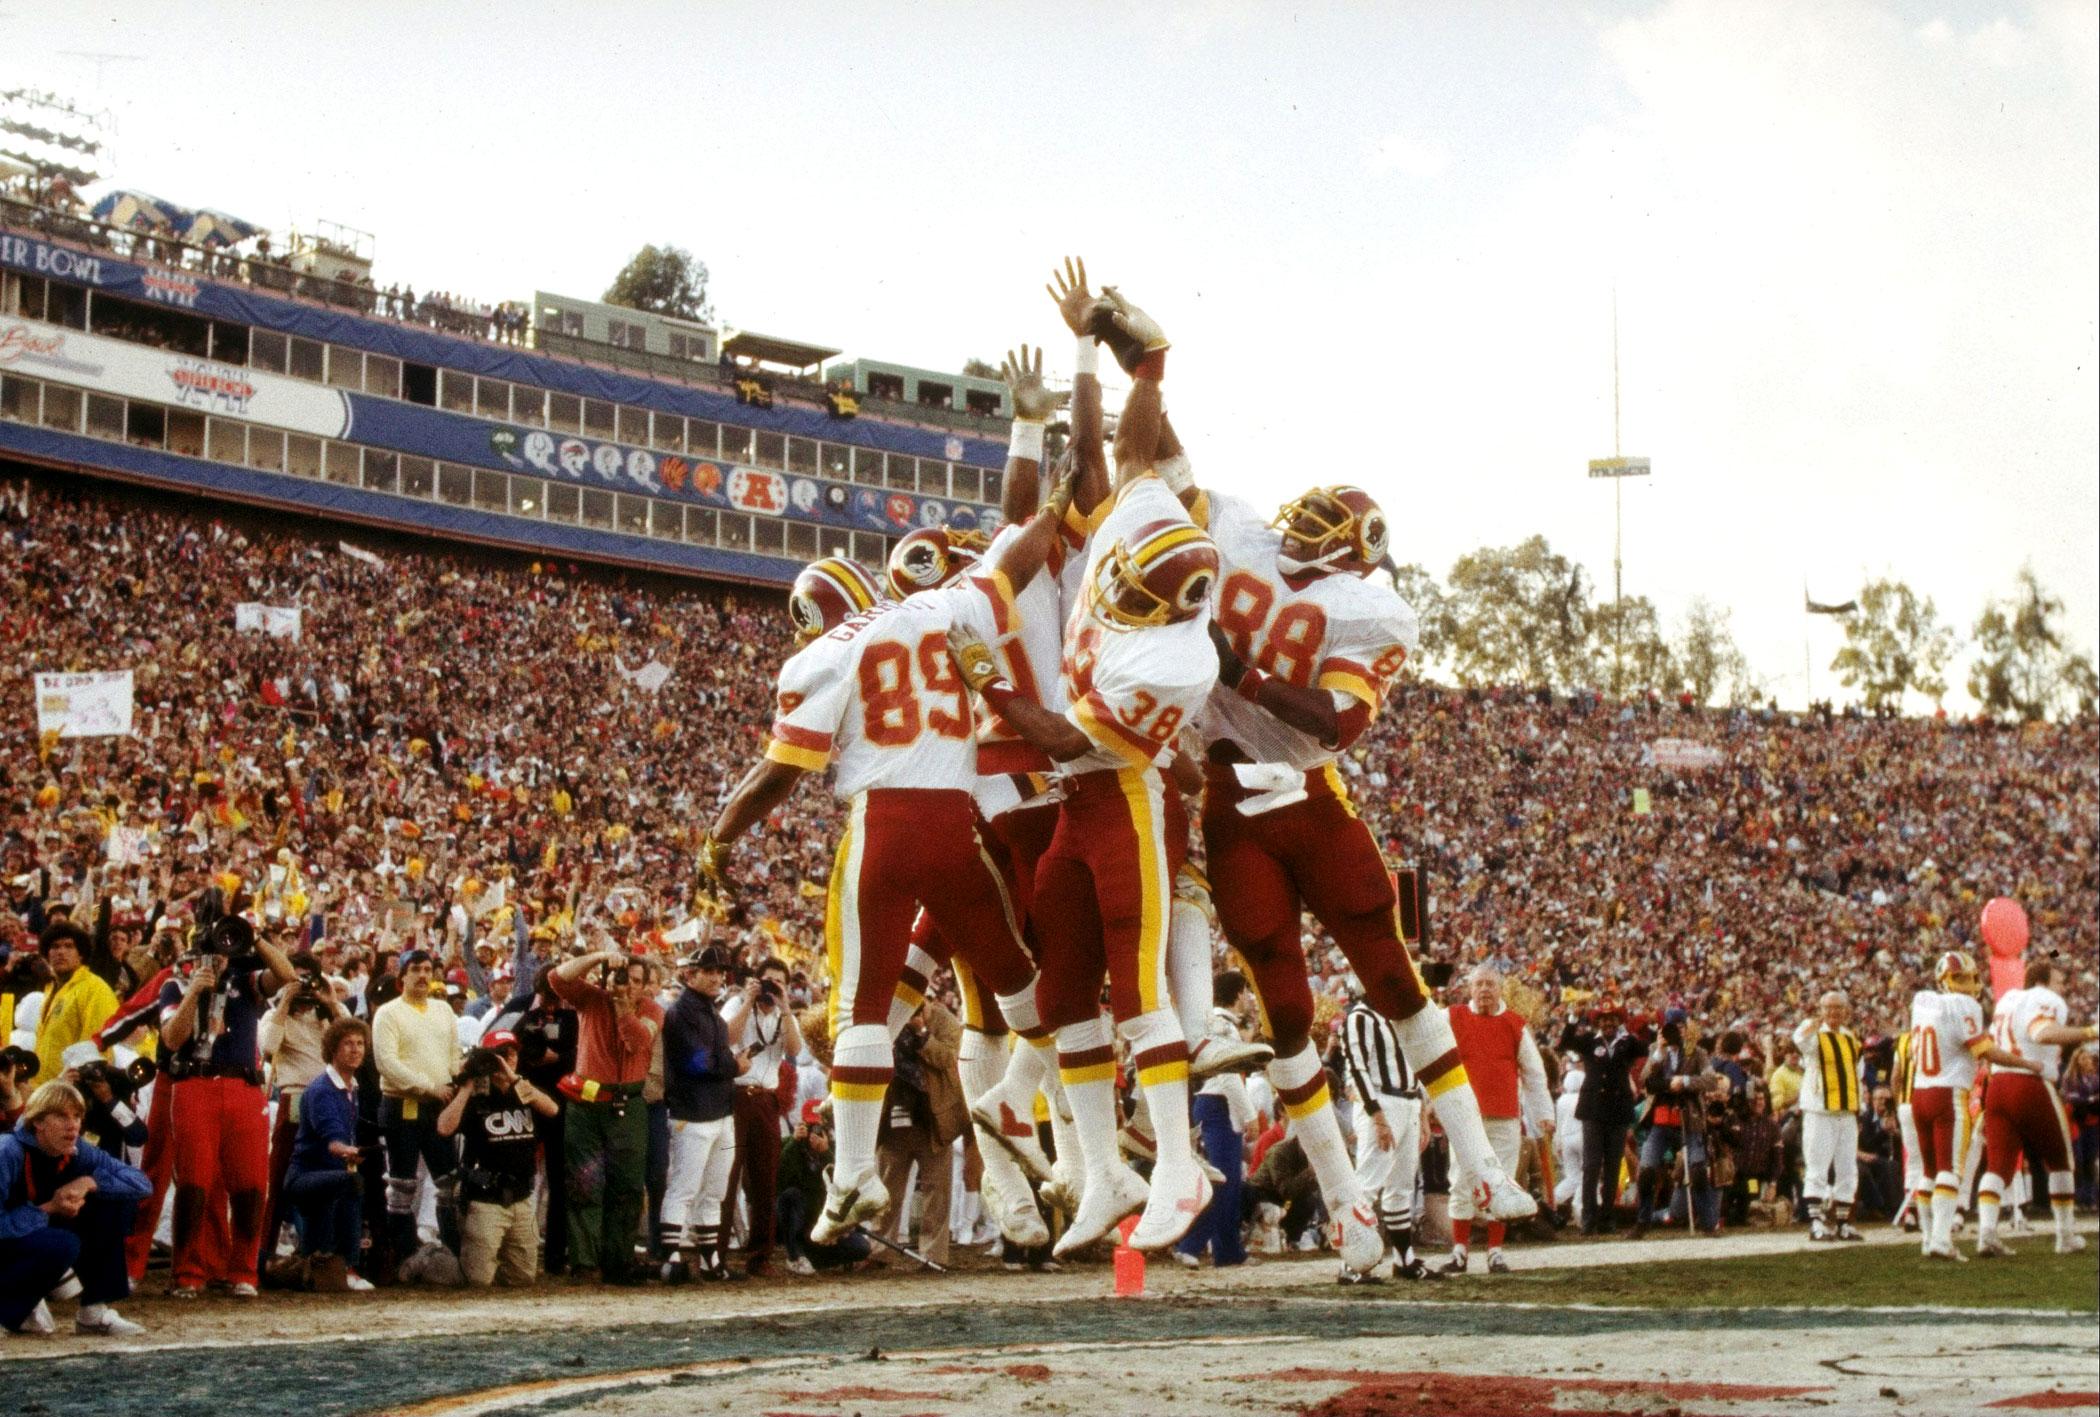 Super Bowl XVII, Jan. 30, 1983                               Washington Redskins vs Miami Dolphins in Pasadena, Calif.